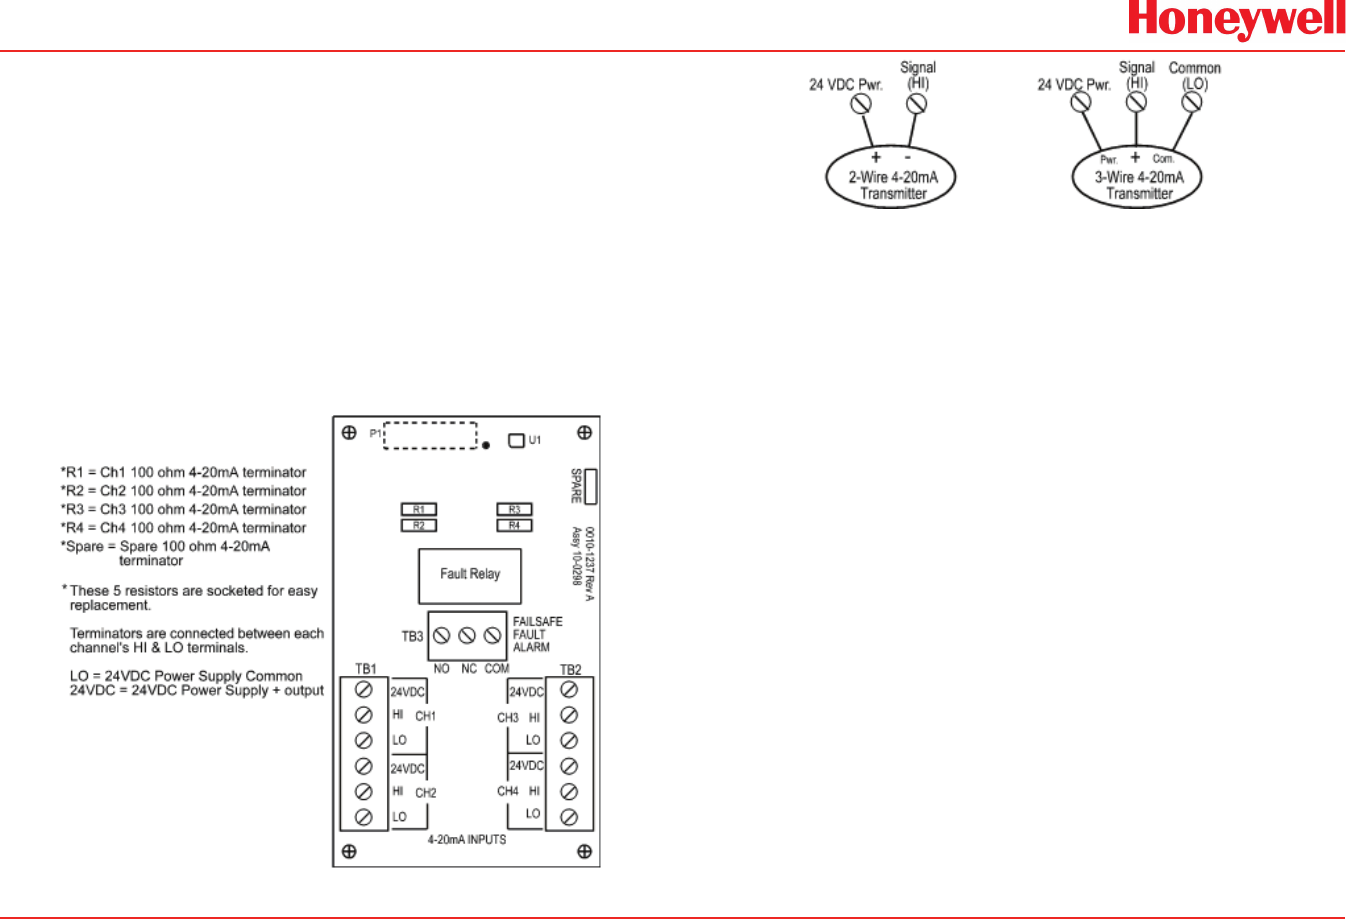 Honeywell Ma Wiring Diagram on rs-422 wiring-diagram, 7 round wiring-diagram, devicenet wiring-diagram, 24vdc wiring-diagram, potentiometer wiring-diagram, plc analog input card wiring-diagram, profibus wiring-diagram, 4 wire transmitter wiring-diagram, rtd probe wiring-diagram, ssr wiring-diagram, encoder wiring-diagram, daisy chain wiring-diagram, usb wiring-diagram, motion detector lights wiring-diagram, 4 wire rtd wiring-diagram, transducer wiring-diagram, rs485 wiring-diagram, pyrometer wiring-diagram, rs232 wiring-diagram,